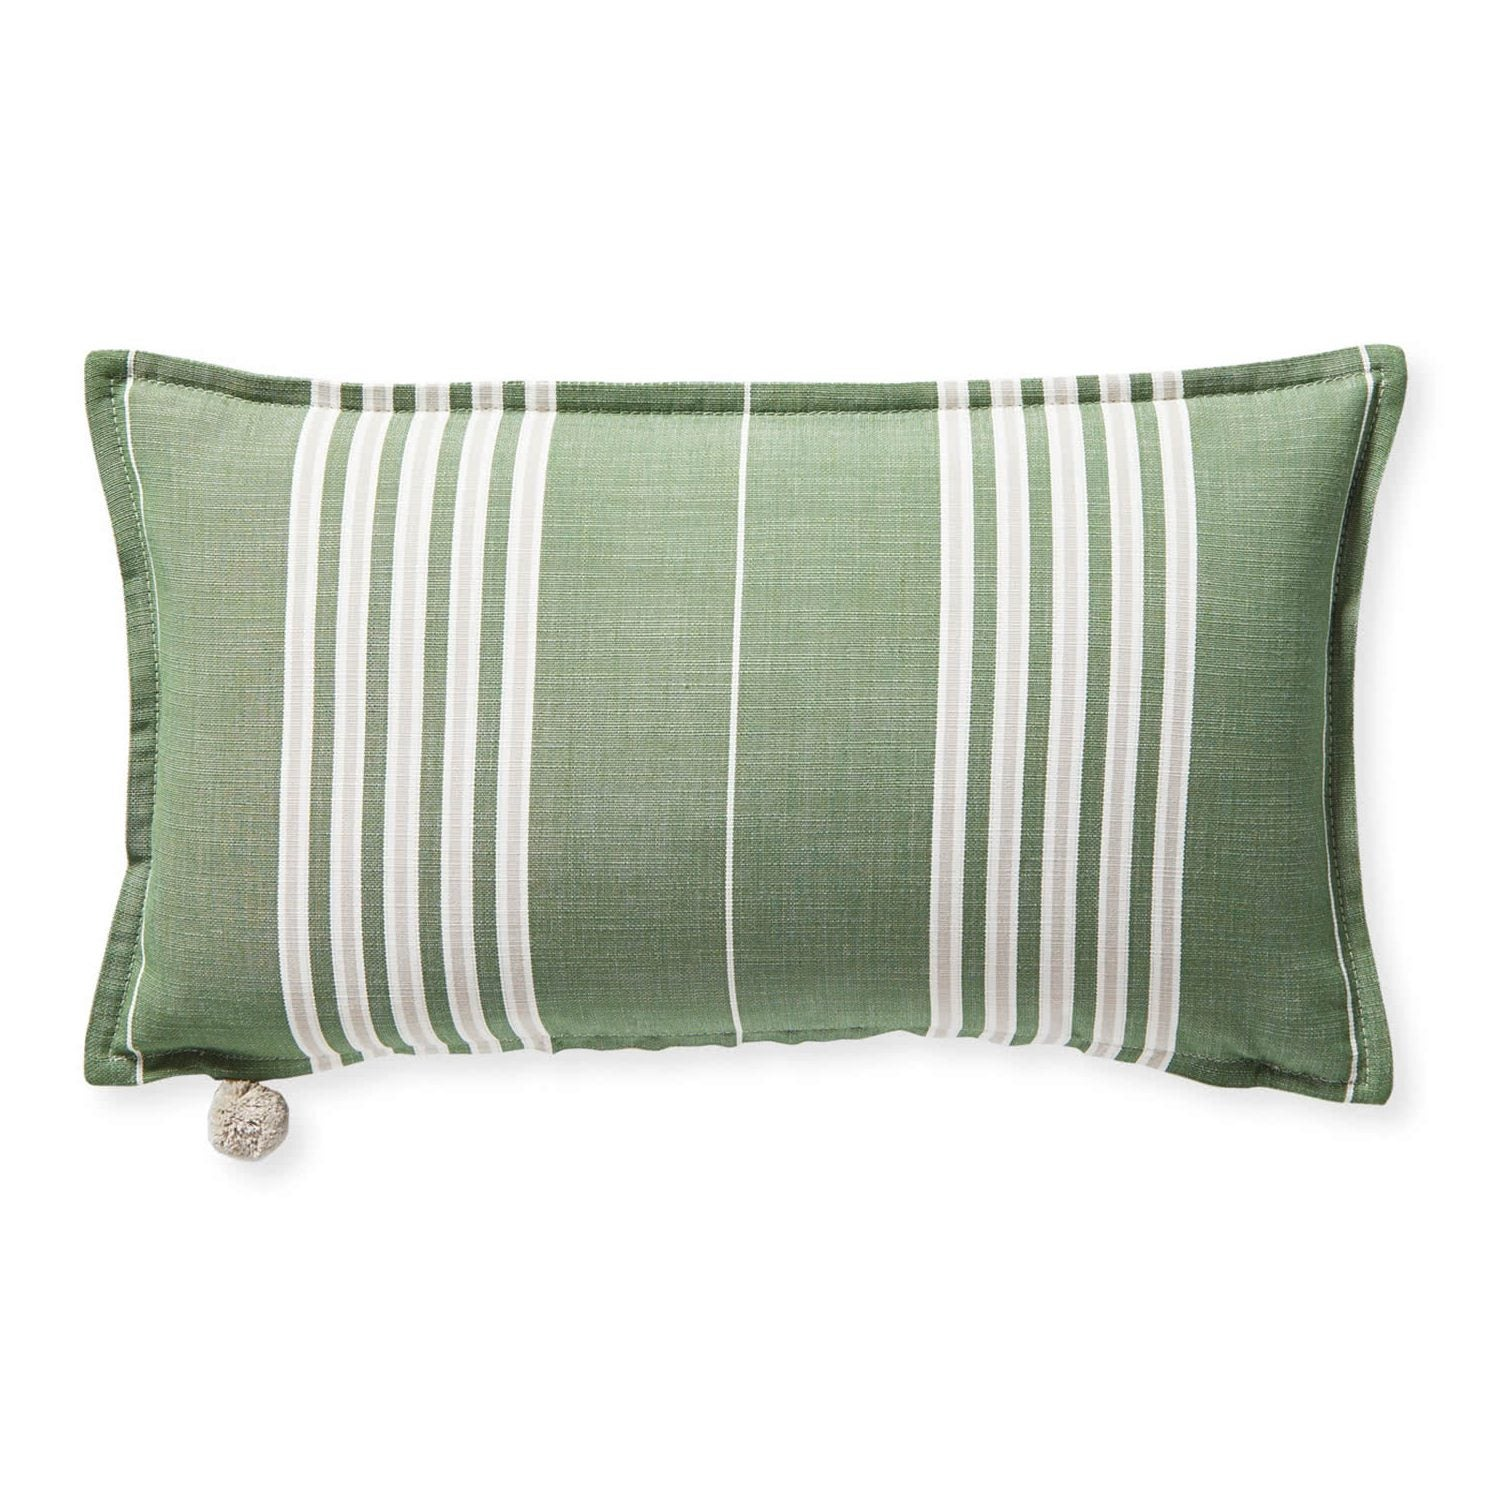 Dec_Pillow_OD_Perennials_Lake_Stripe_12x21_Green_1001_Crop_SH